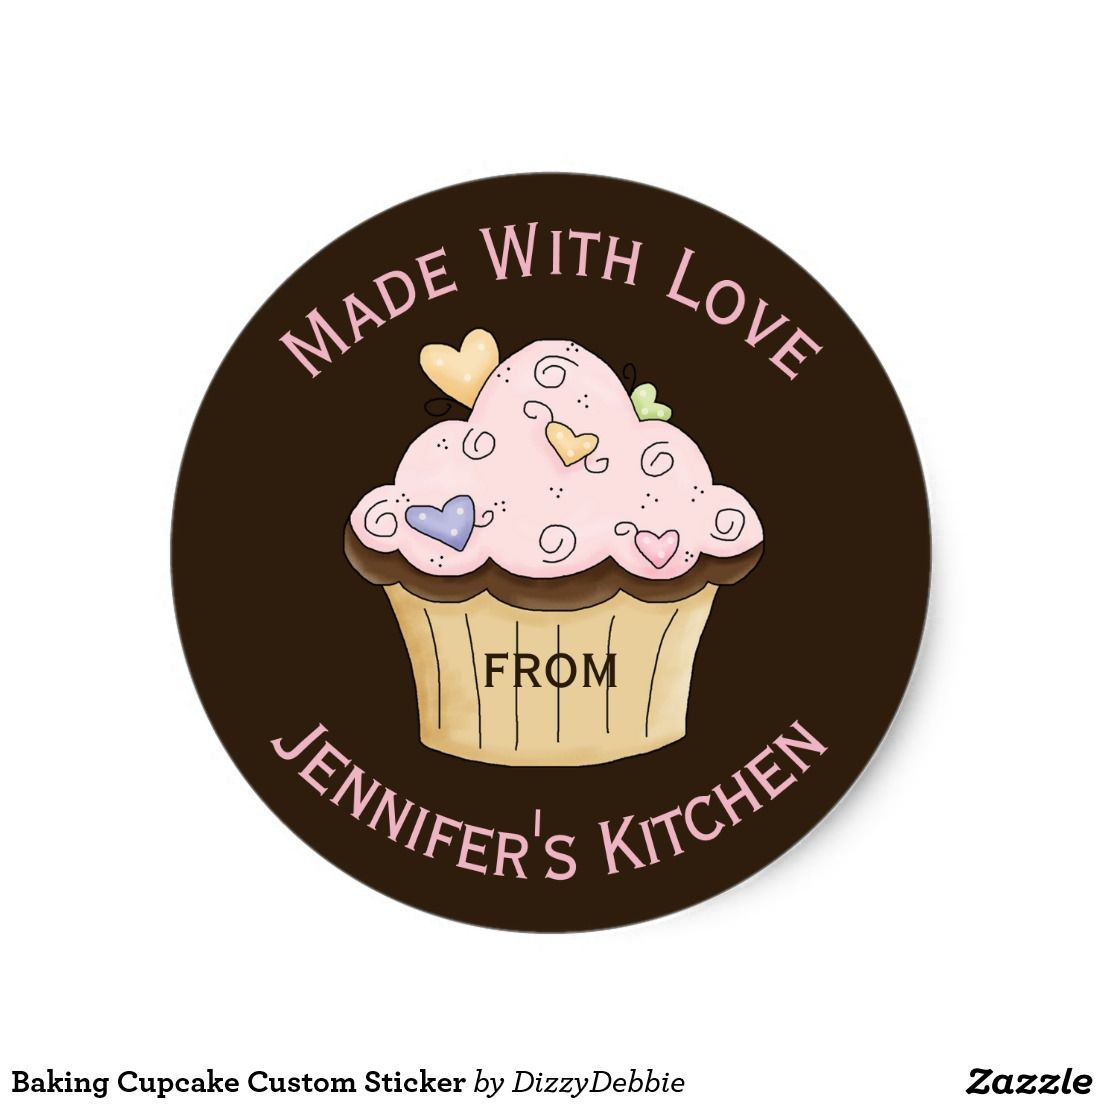 Baking cupcake custom sticker zazzle com in 2019 custom baking